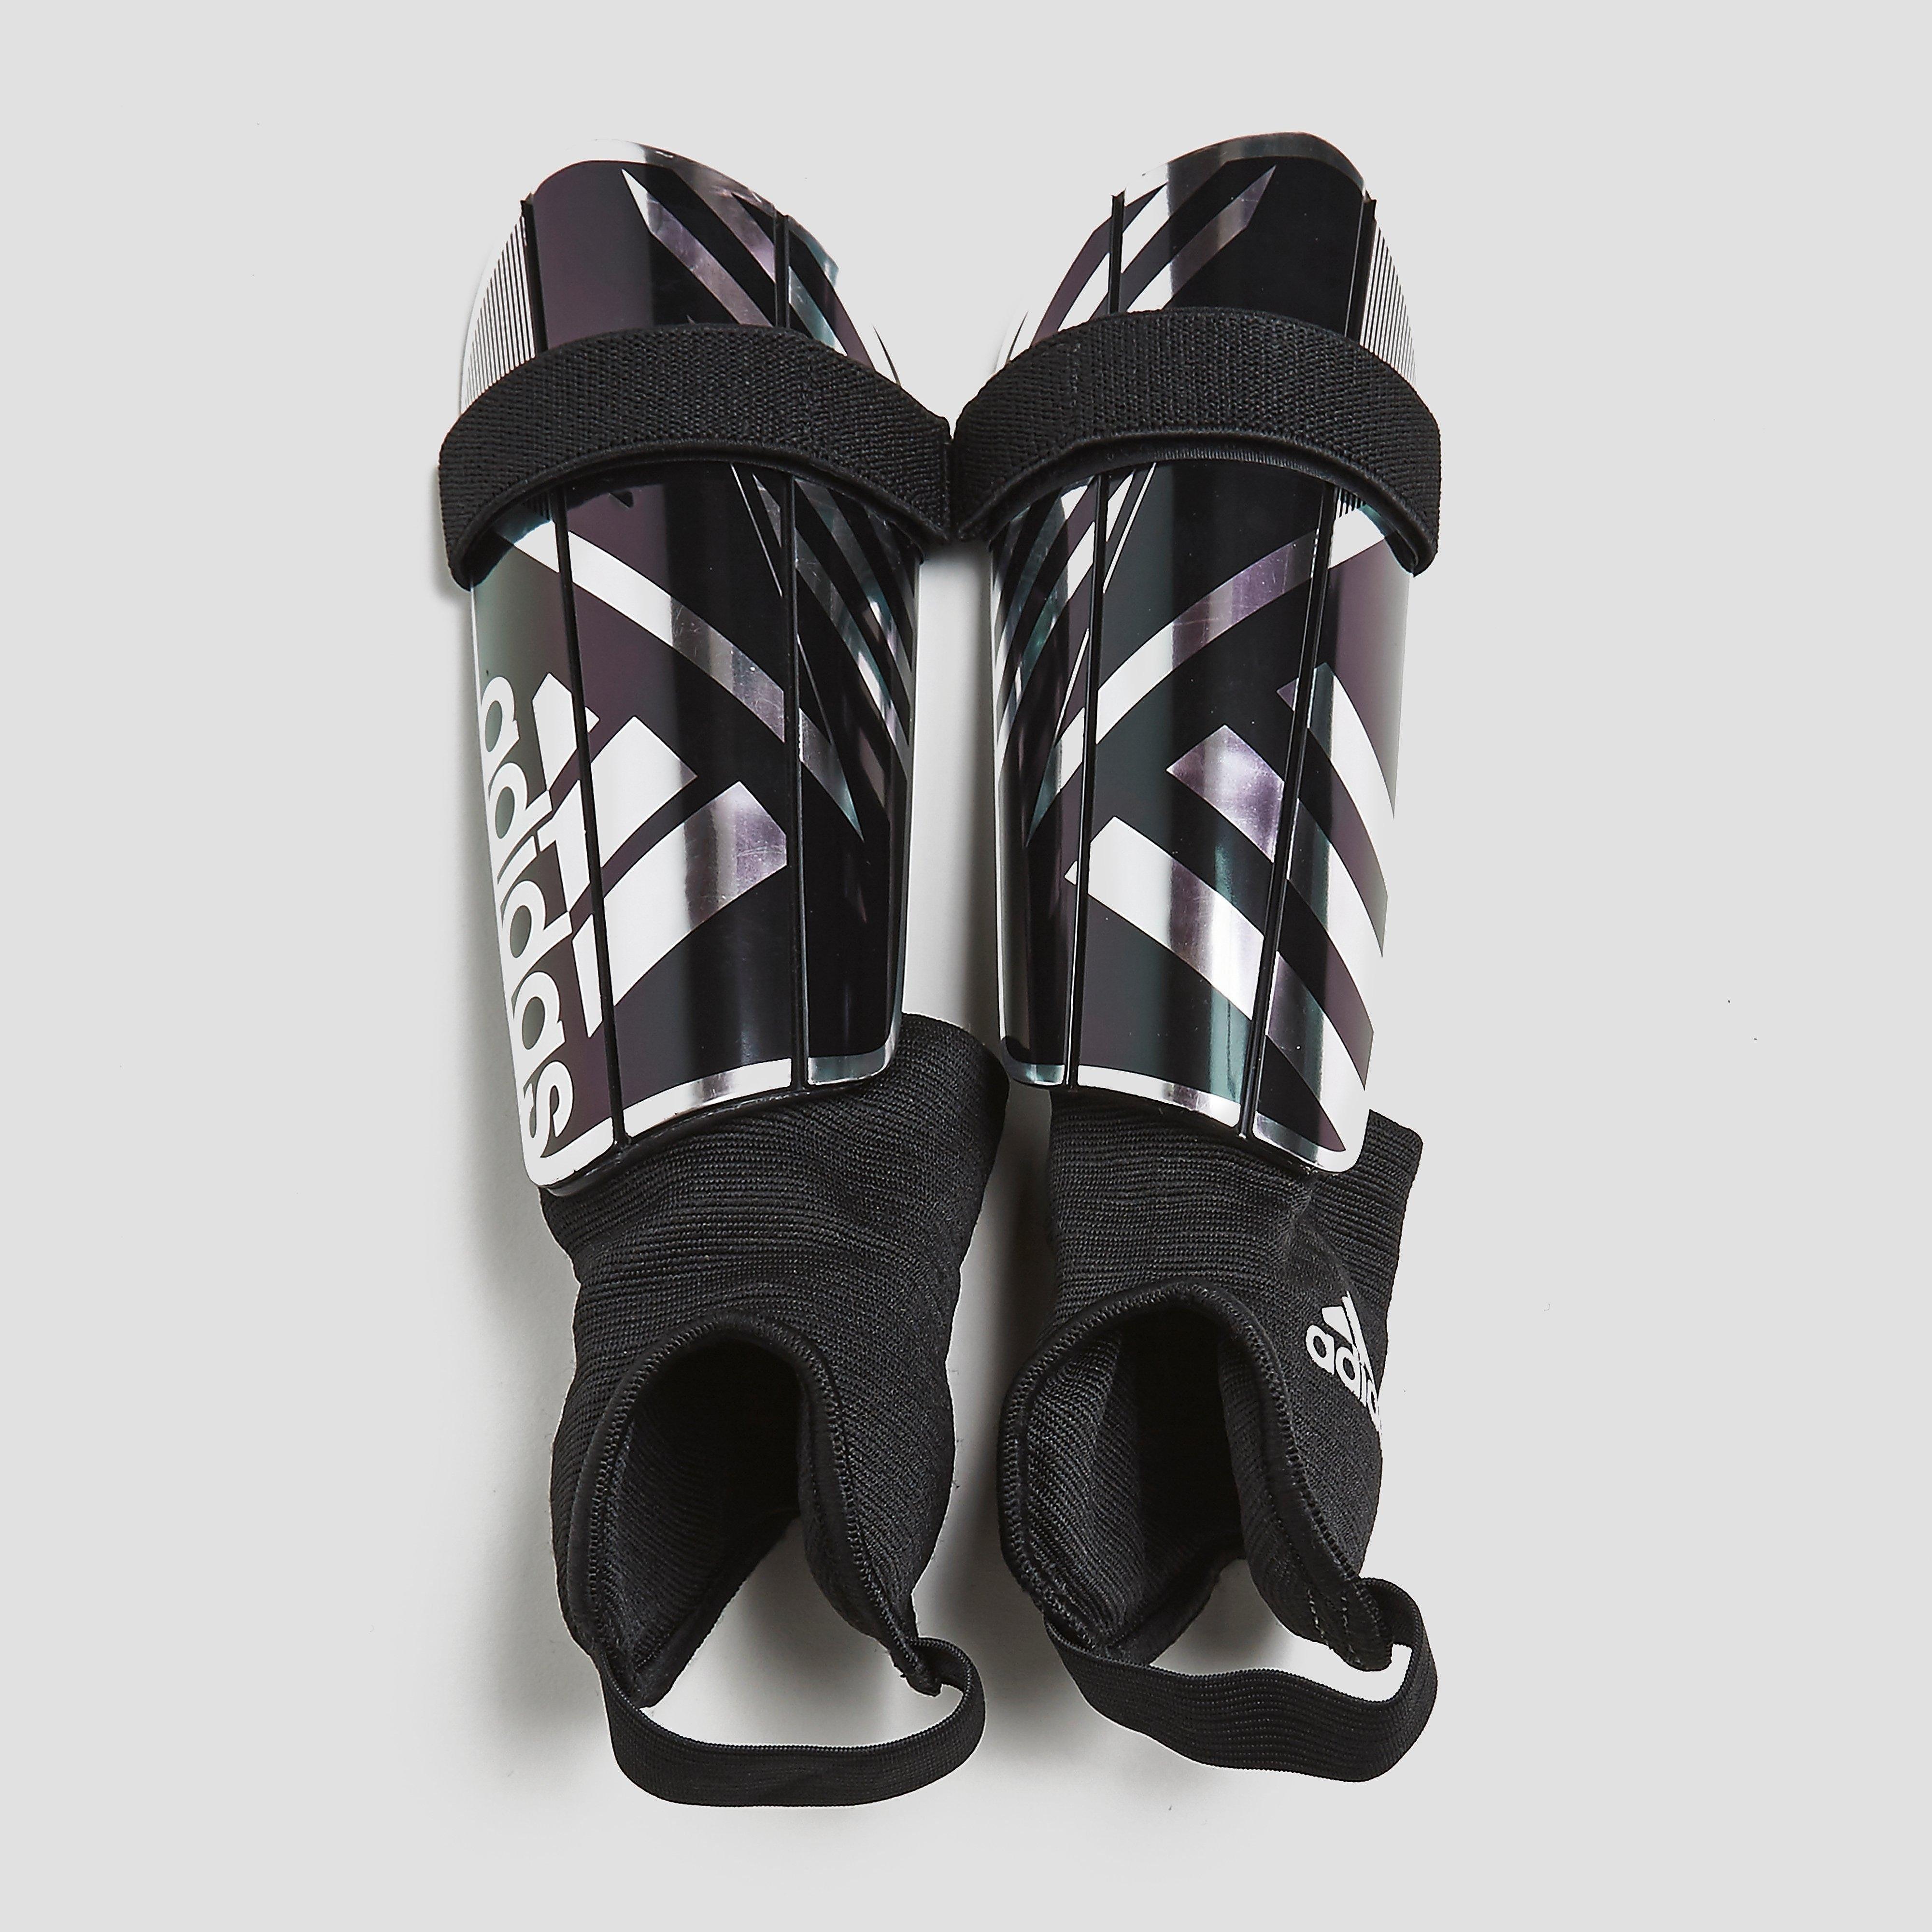 adidas GHOST REFLEX SCHEENBESCHERMERS